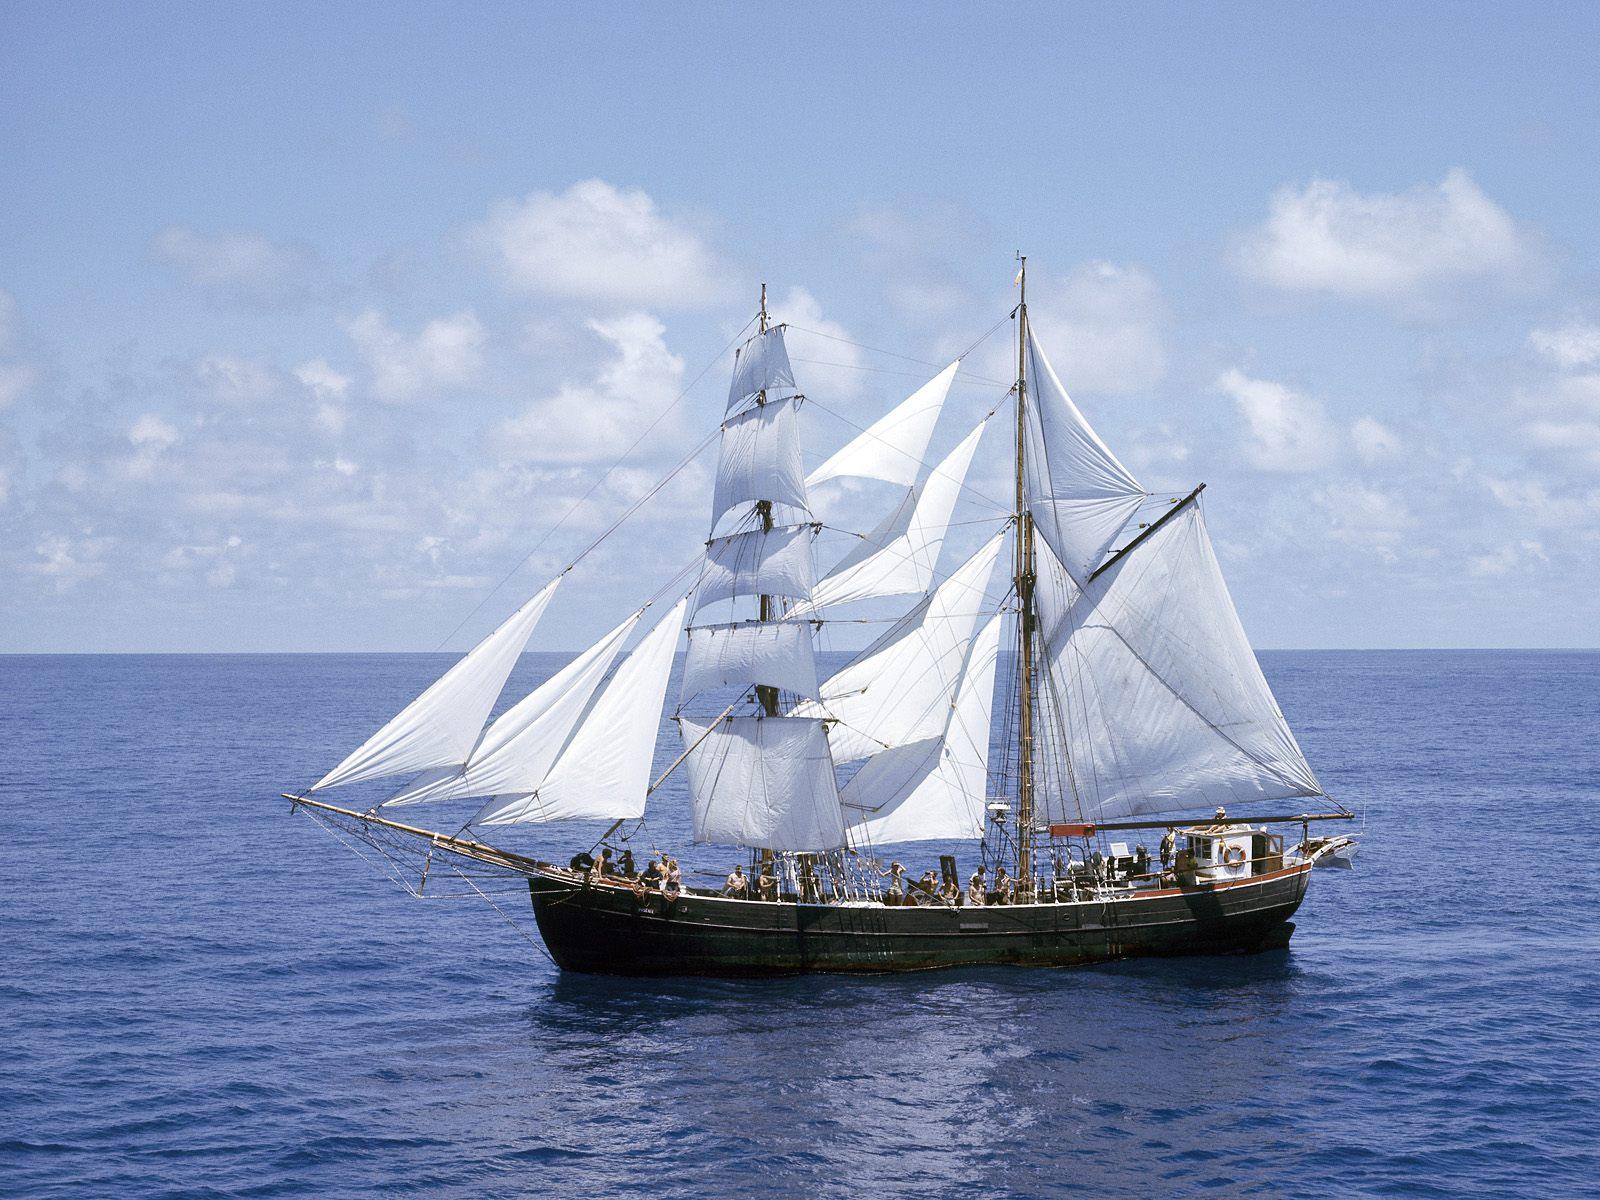 http://2.bp.blogspot.com/-fjAKu5hWlcY/T4rugkr7hGI/AAAAAAAAArU/dRzil0GGzOc/s1600/boat+1.jpg